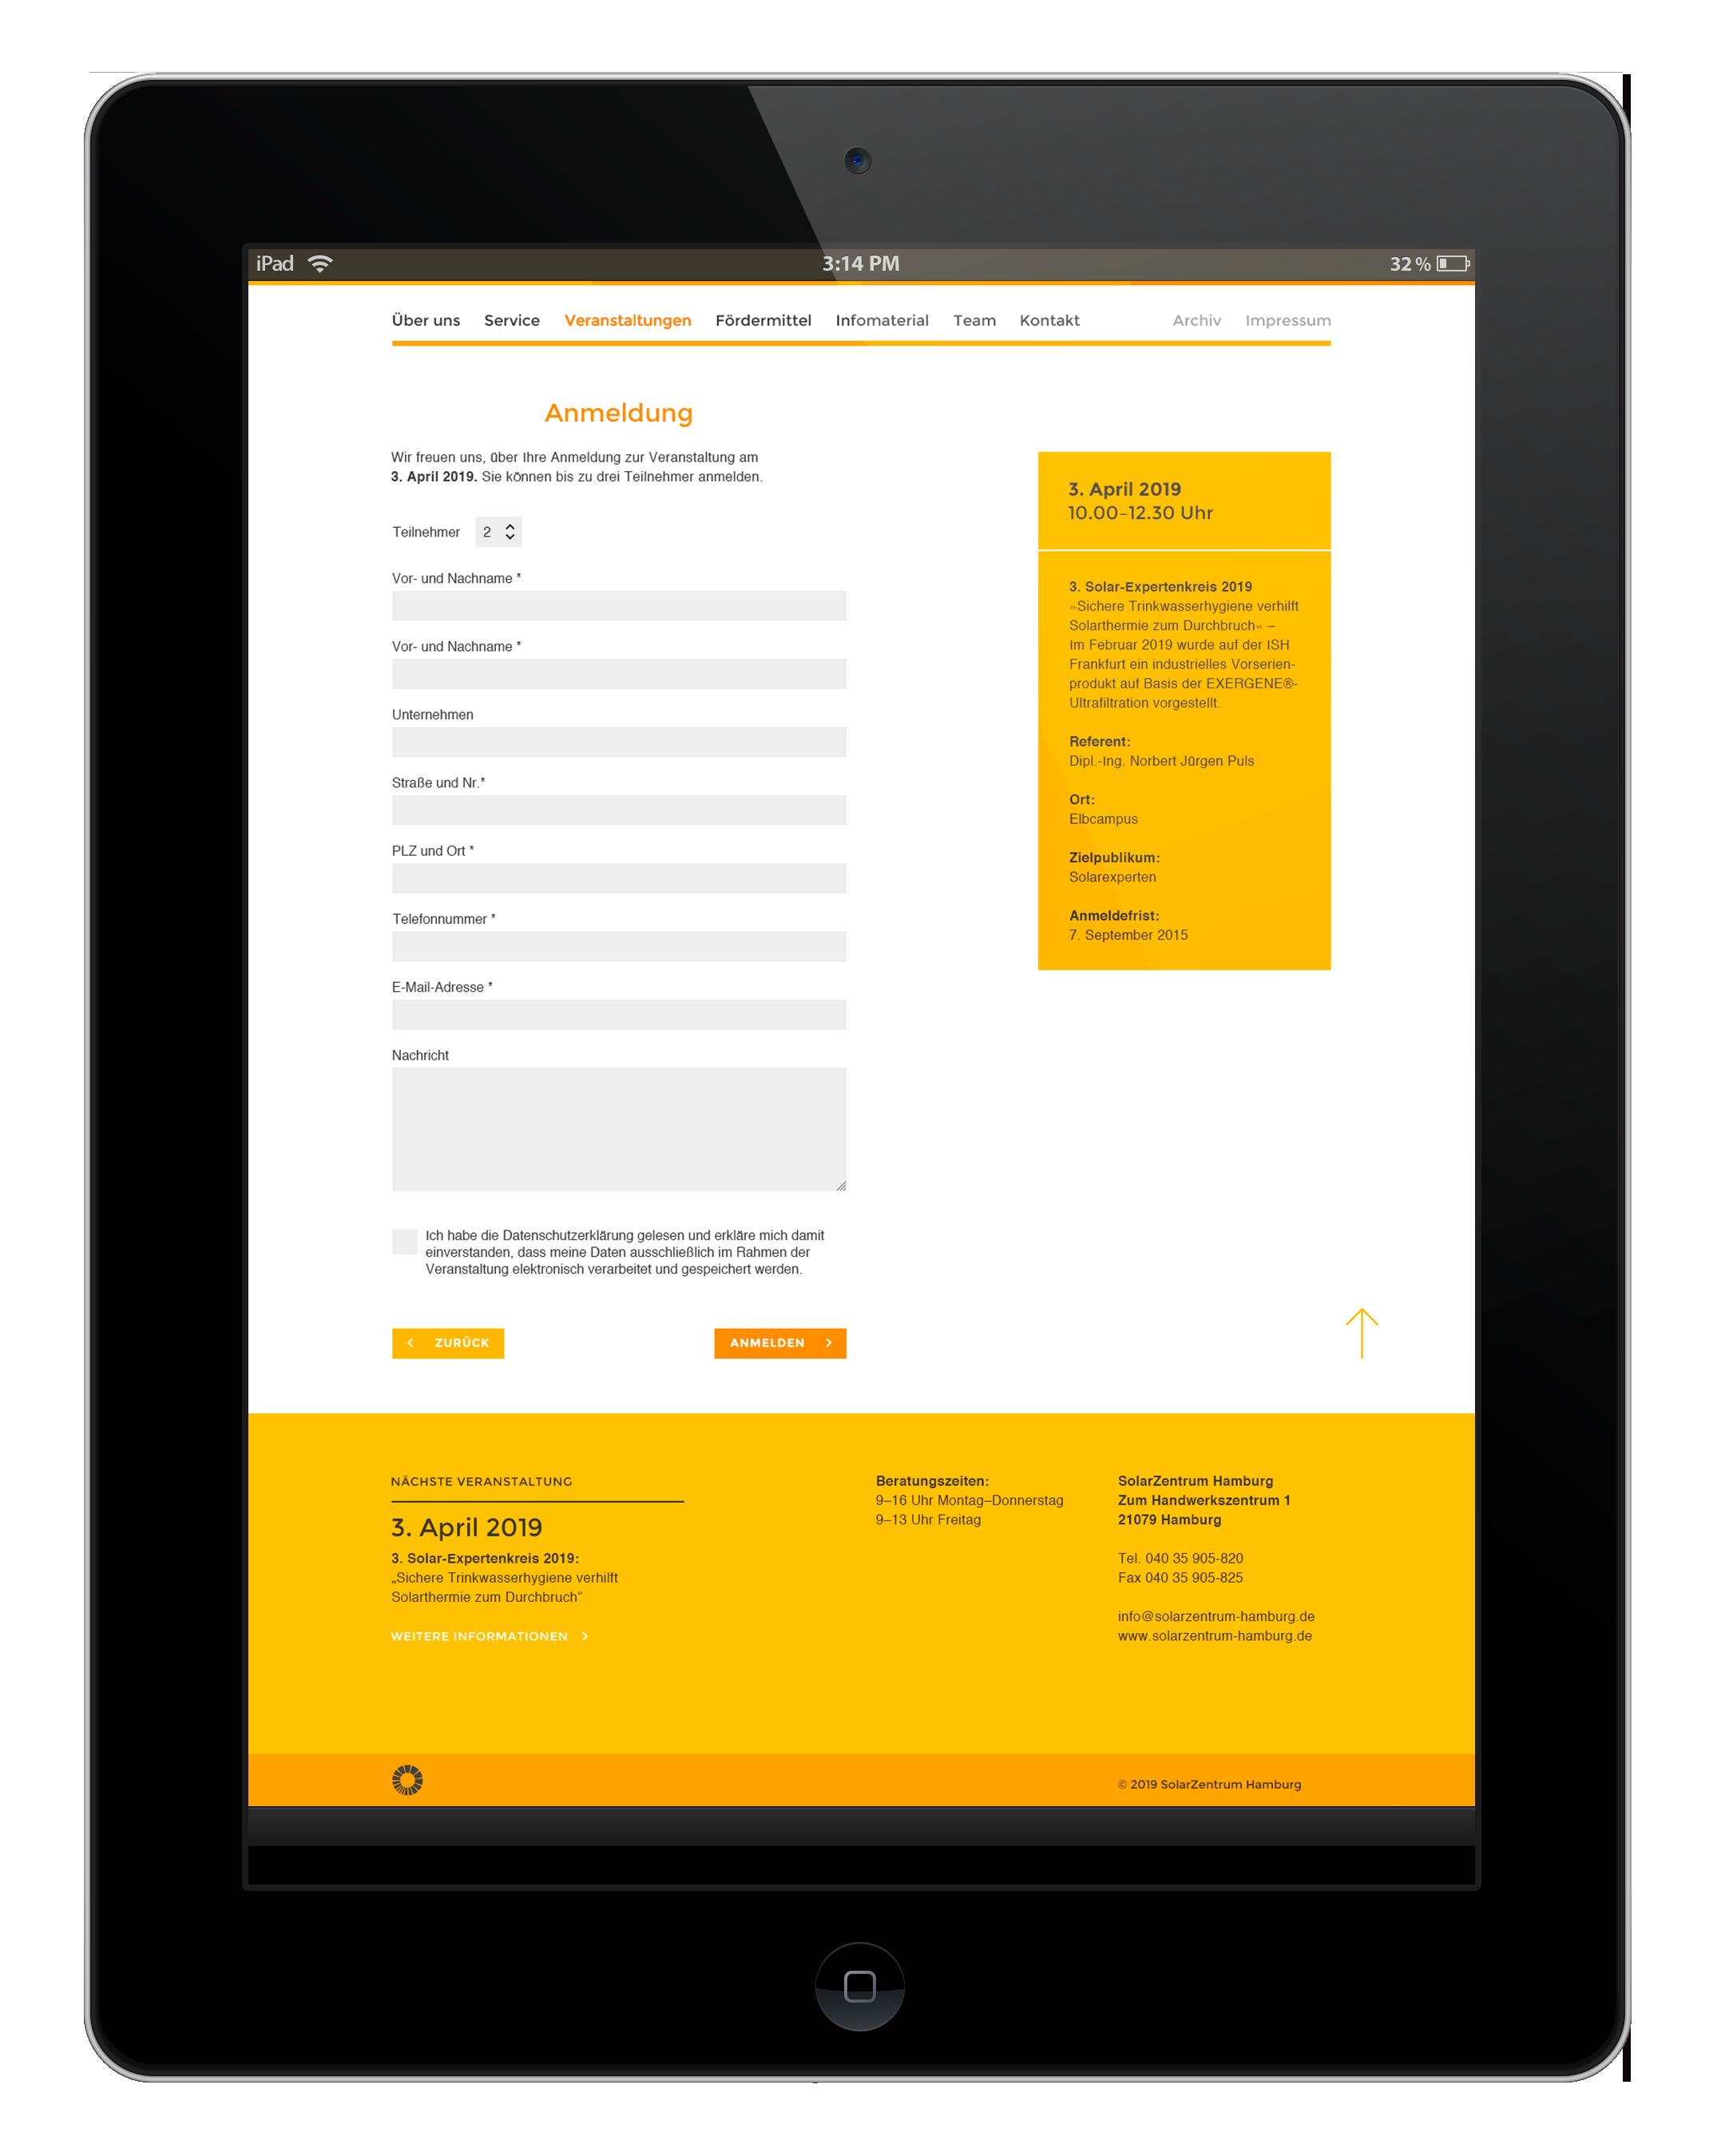 sz_anmeldung_iPad_v2